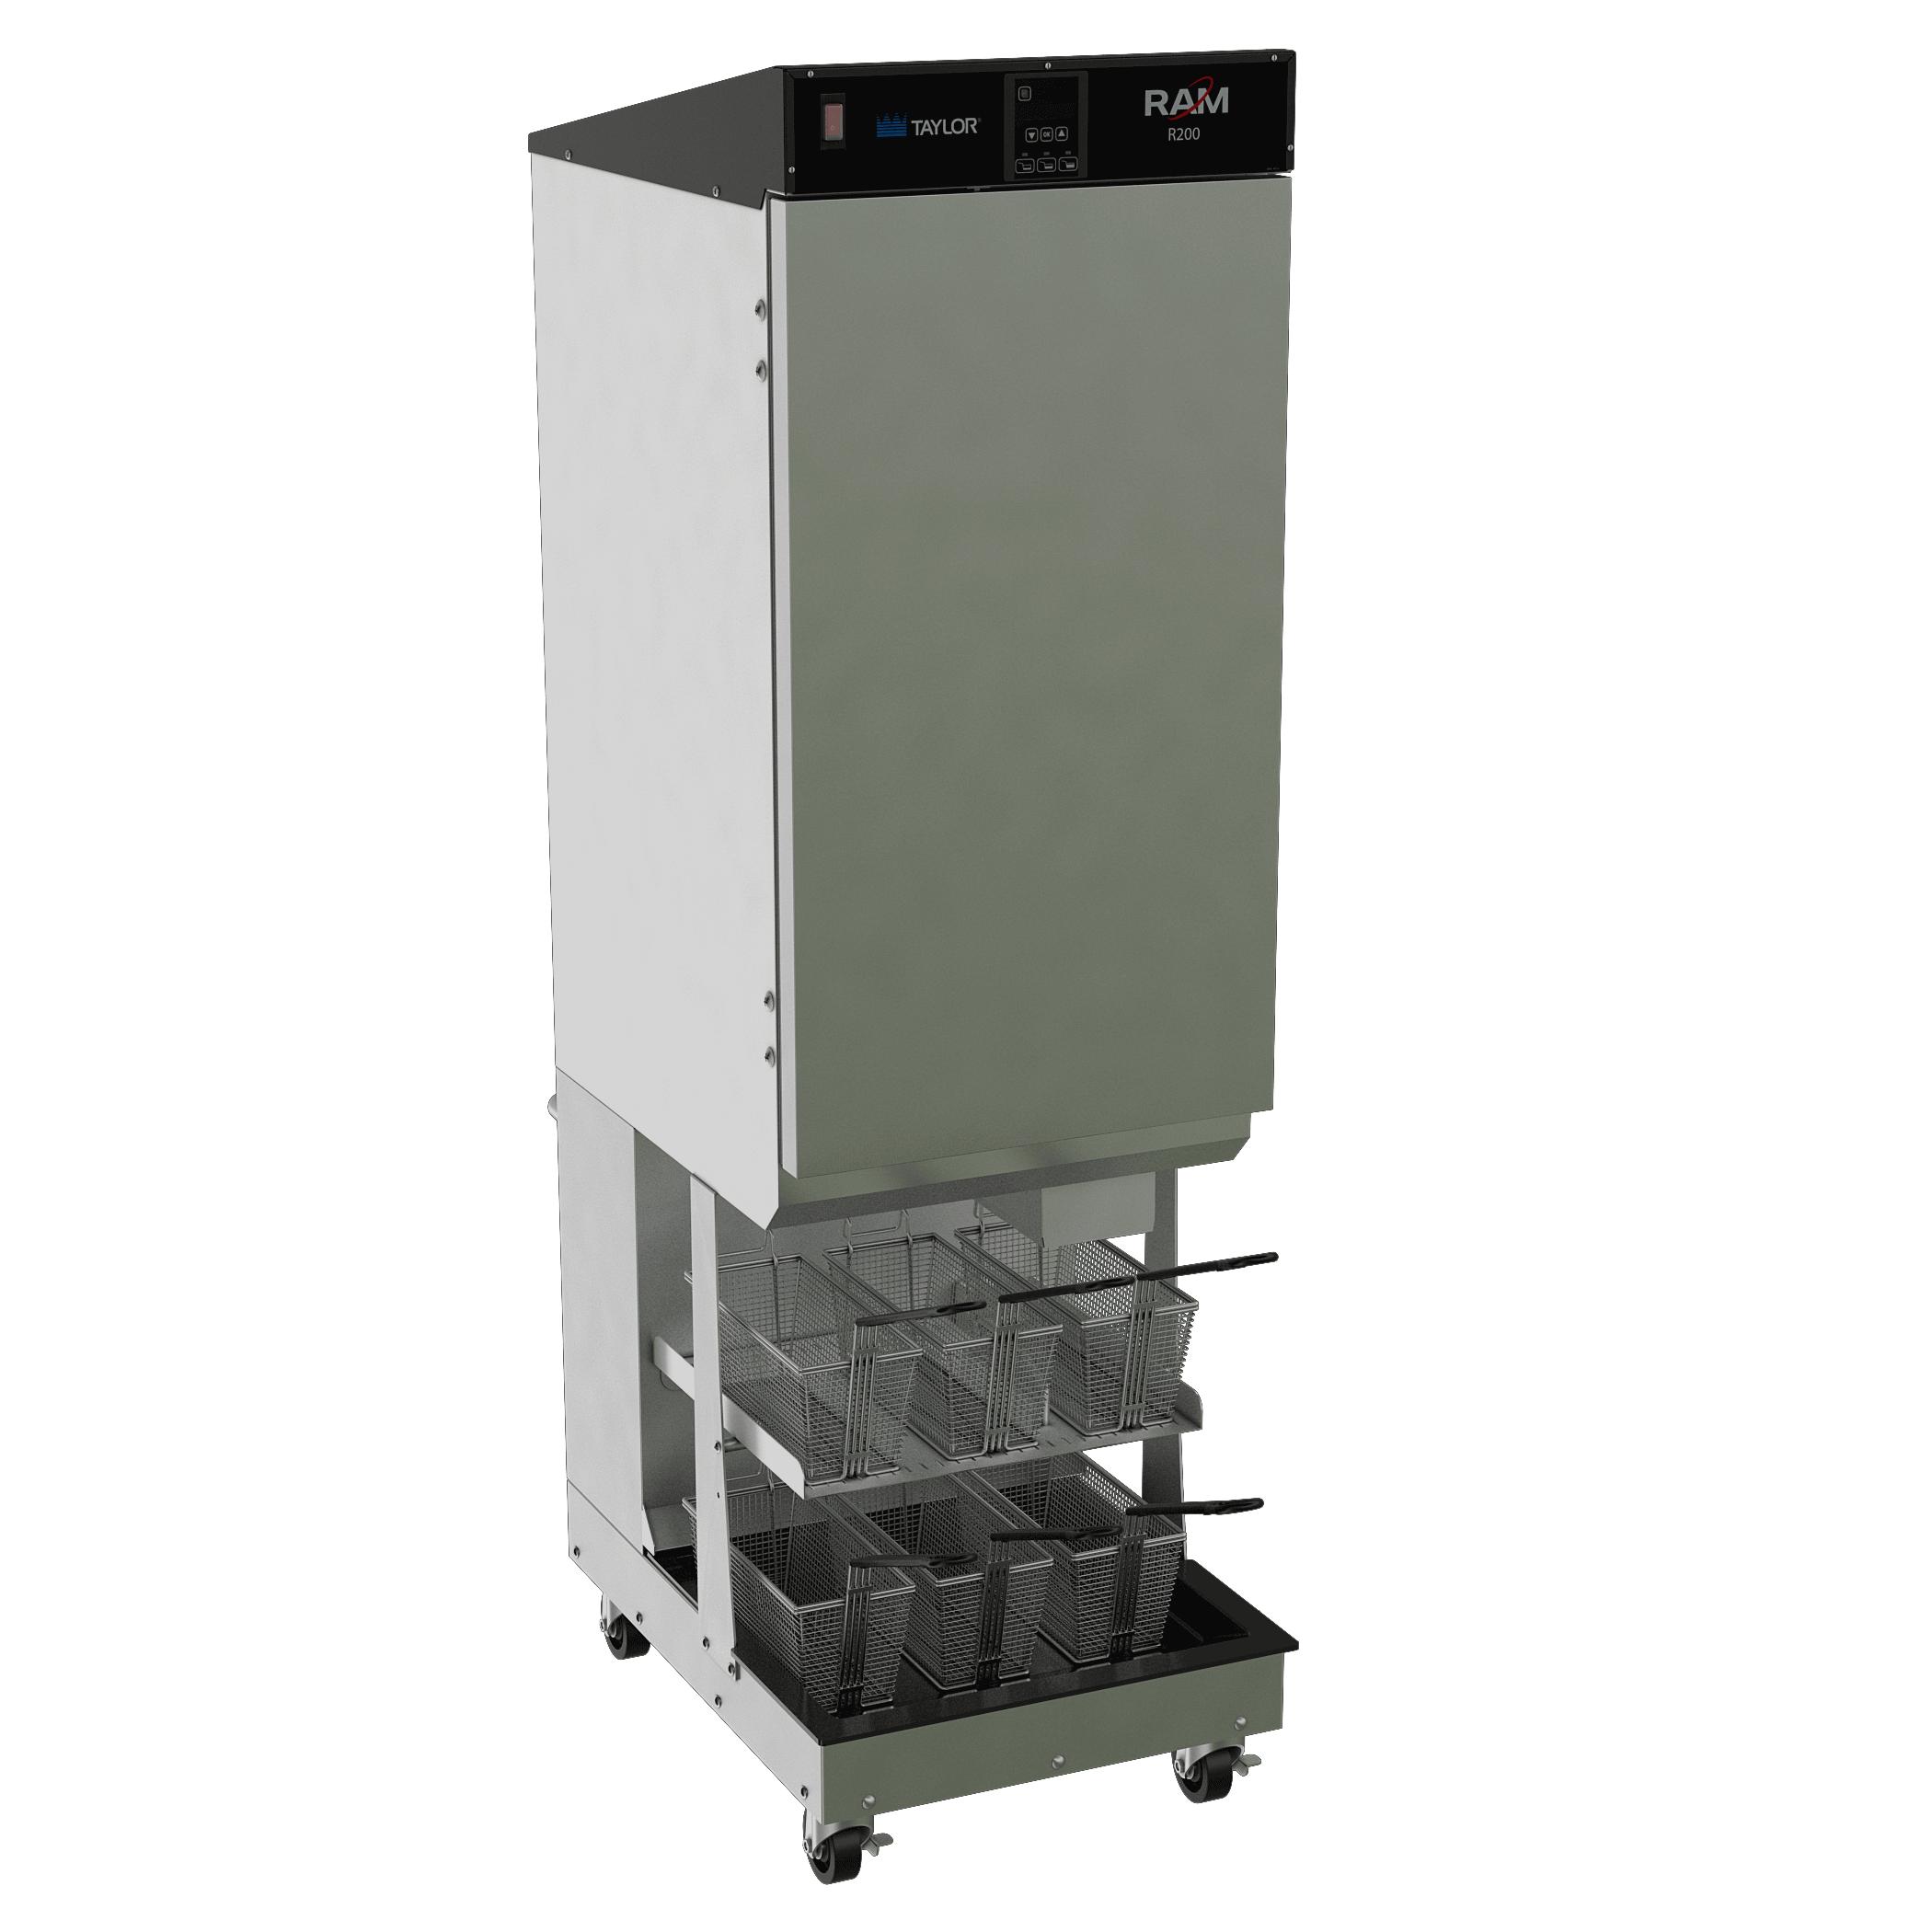 A French fry dispenser equipment